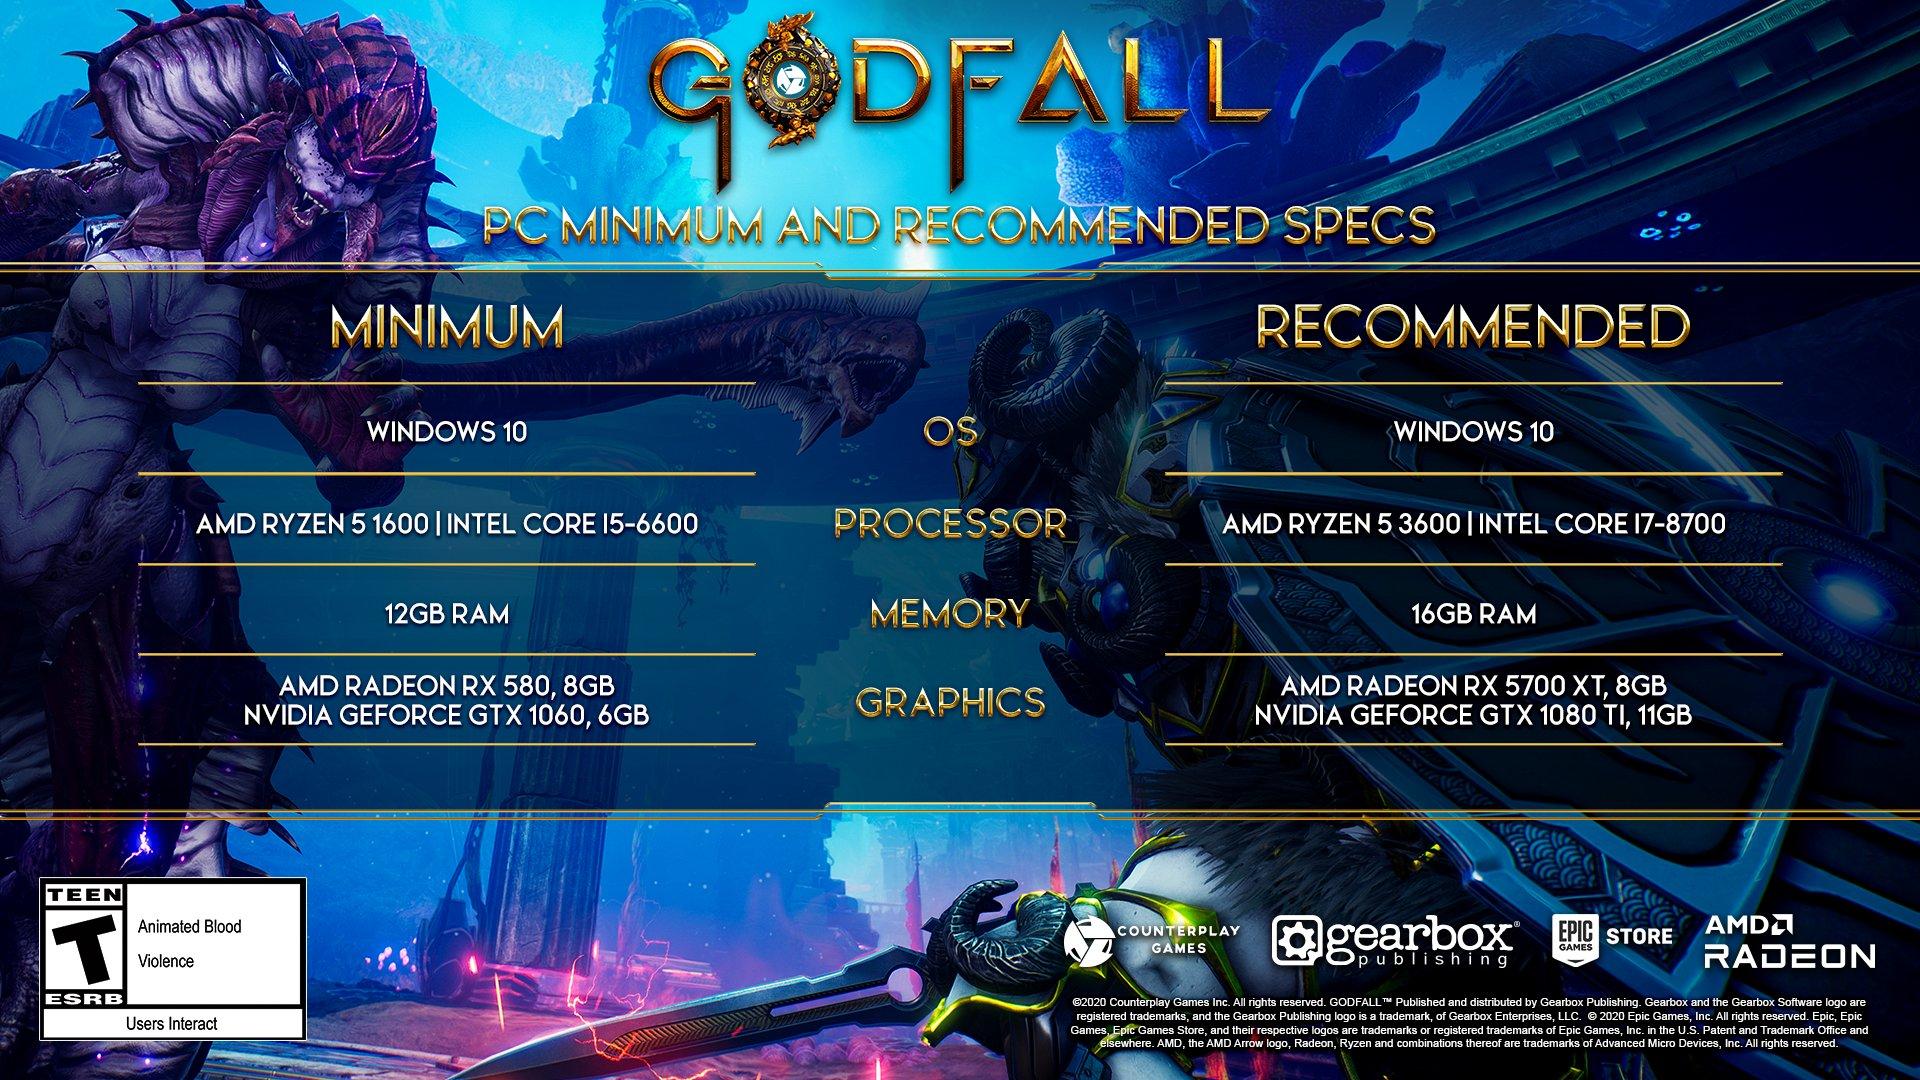 Godfall Counterplay Games AMD RX 6000 متطلبات تشغيل